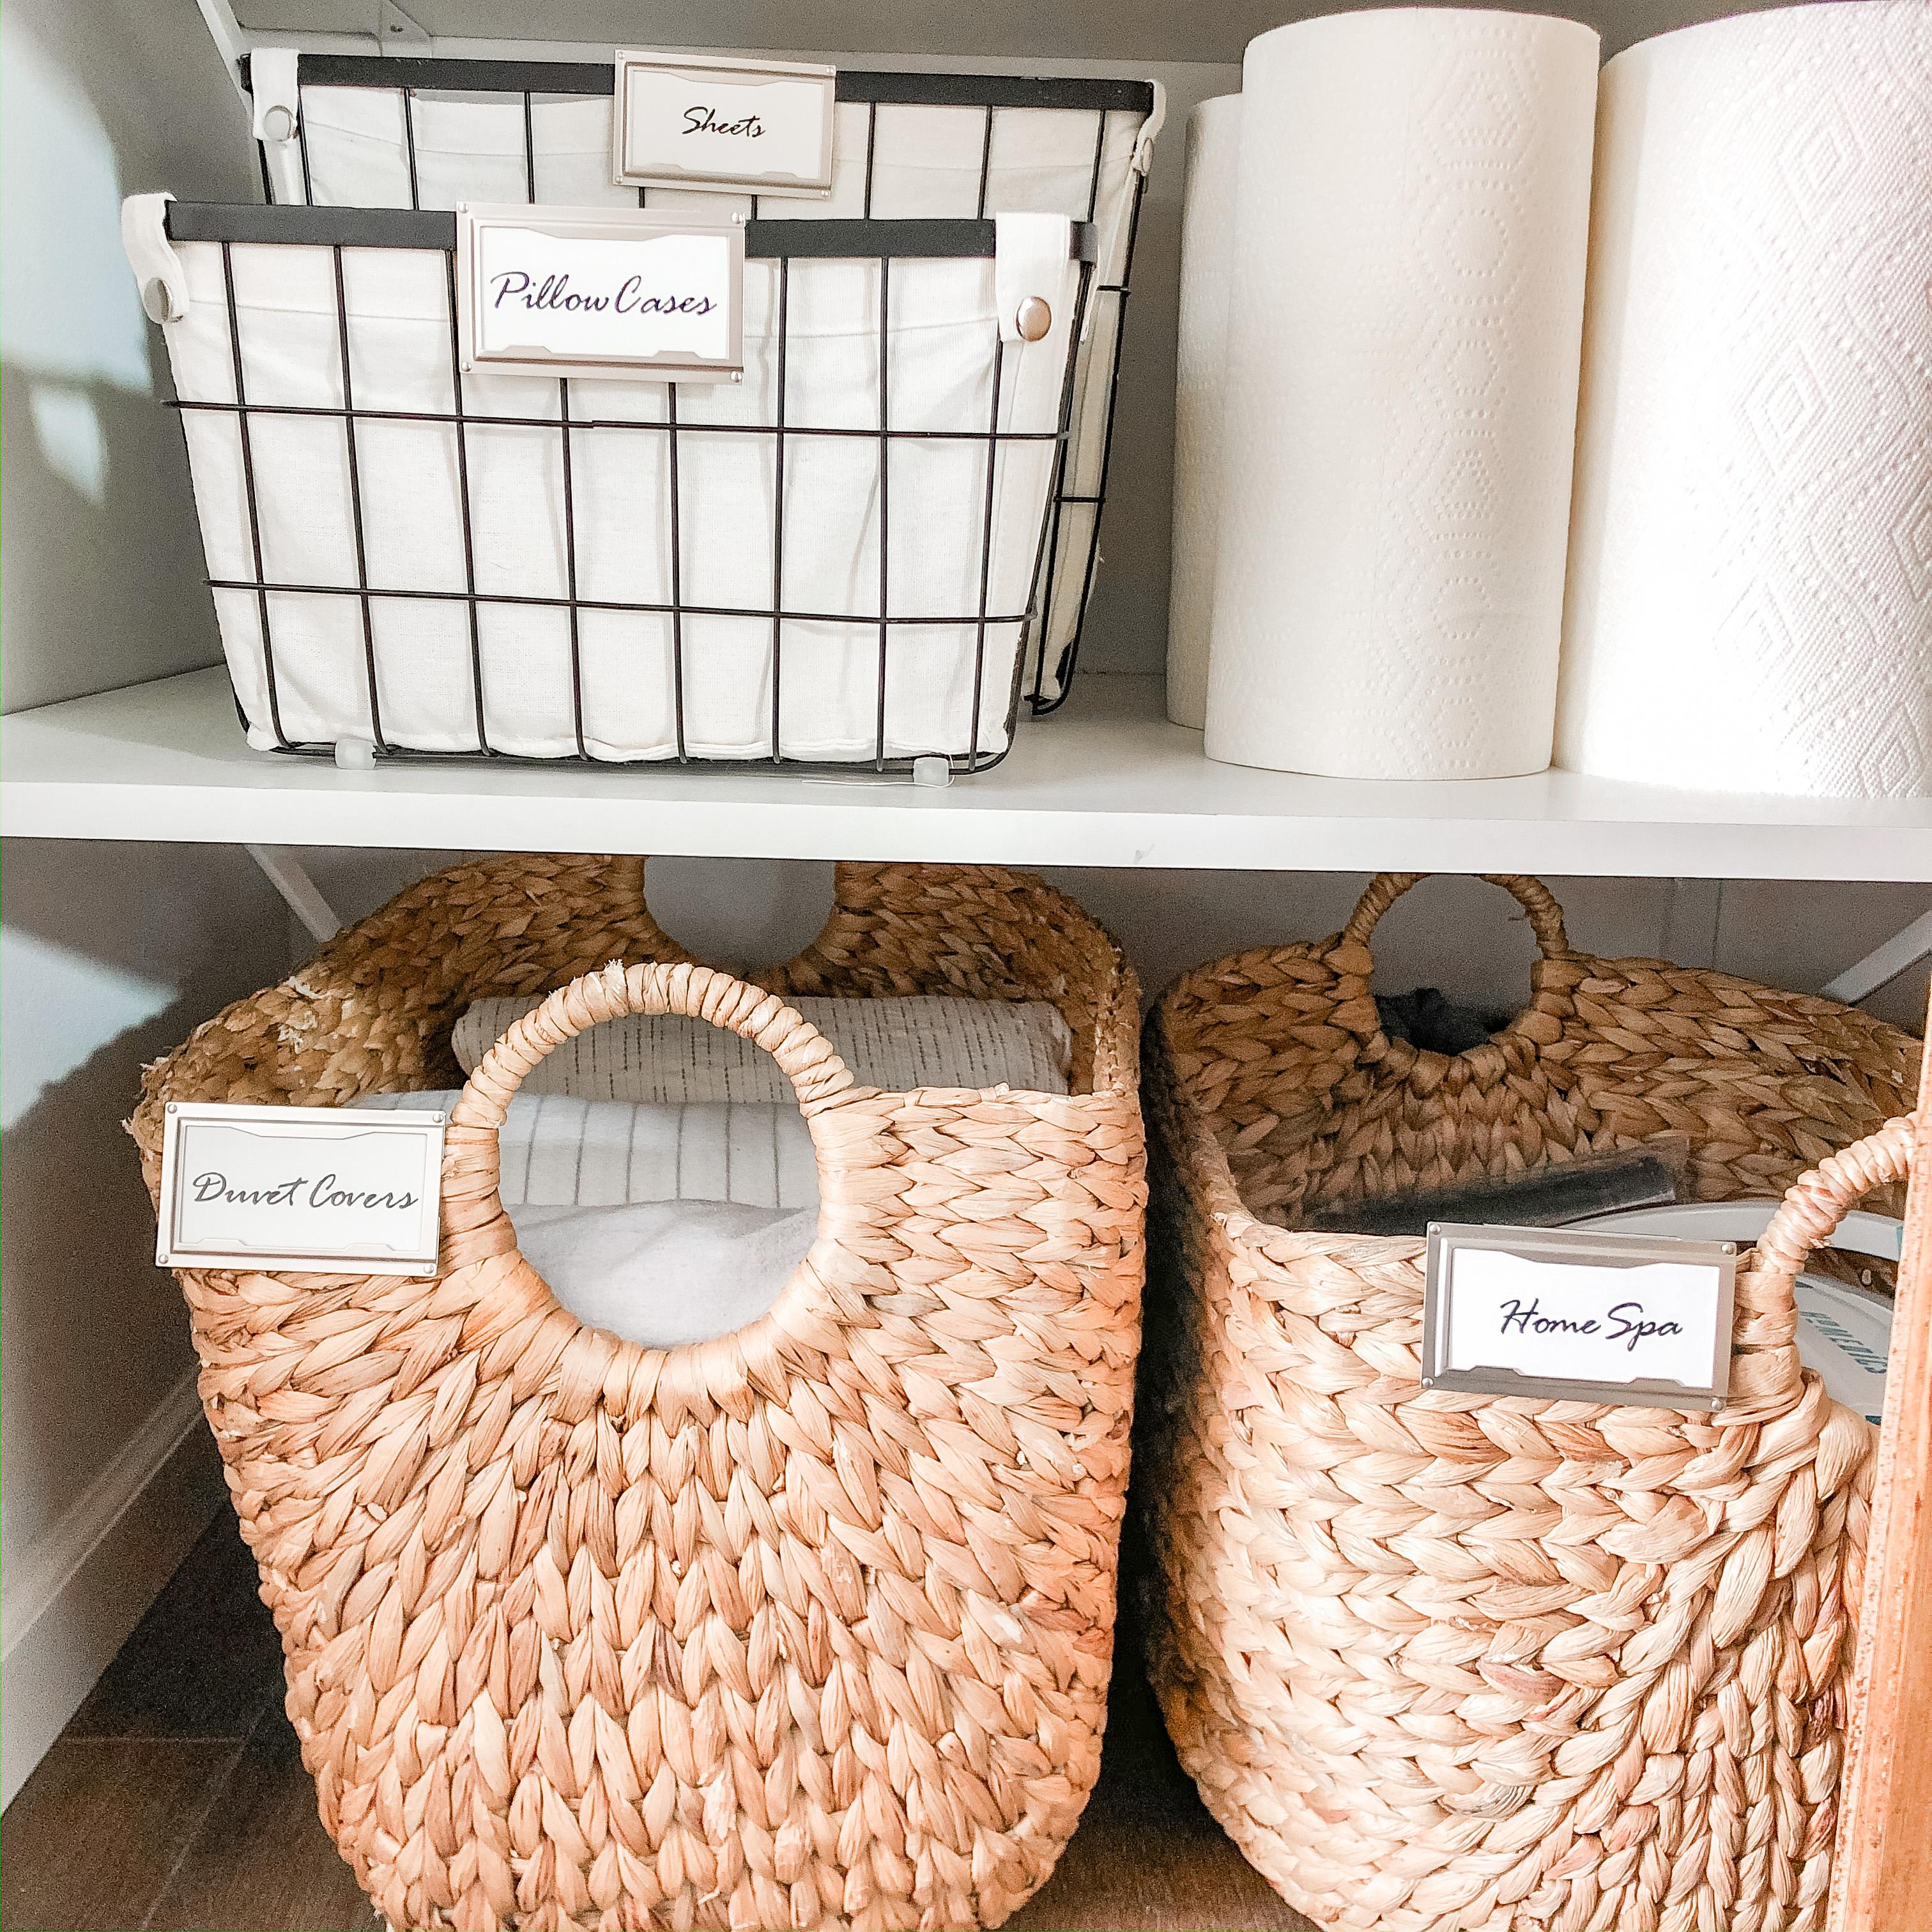 Linen Closet with Custom Labels